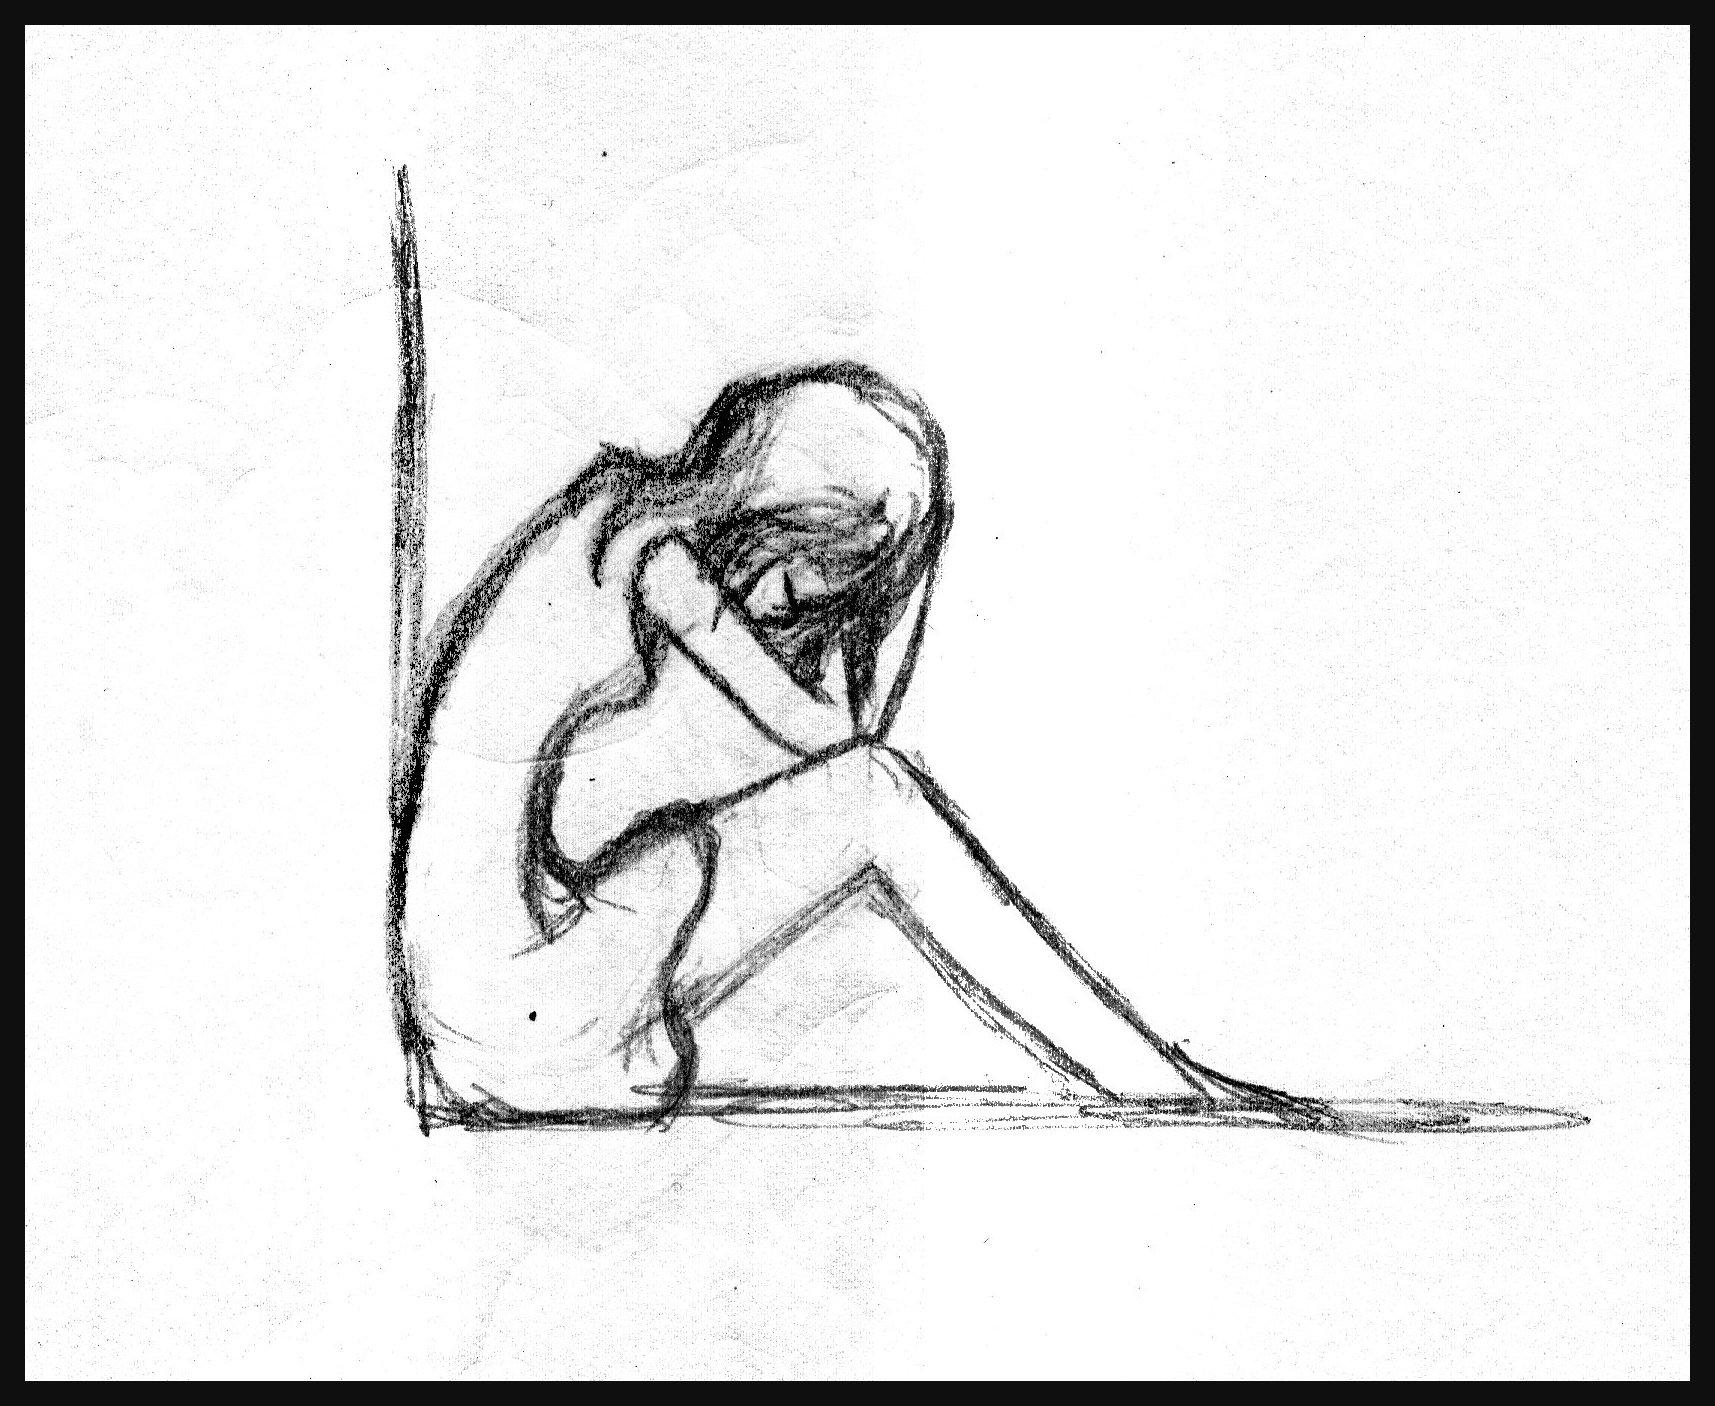 Sad Sad Sad Girl by starlightx